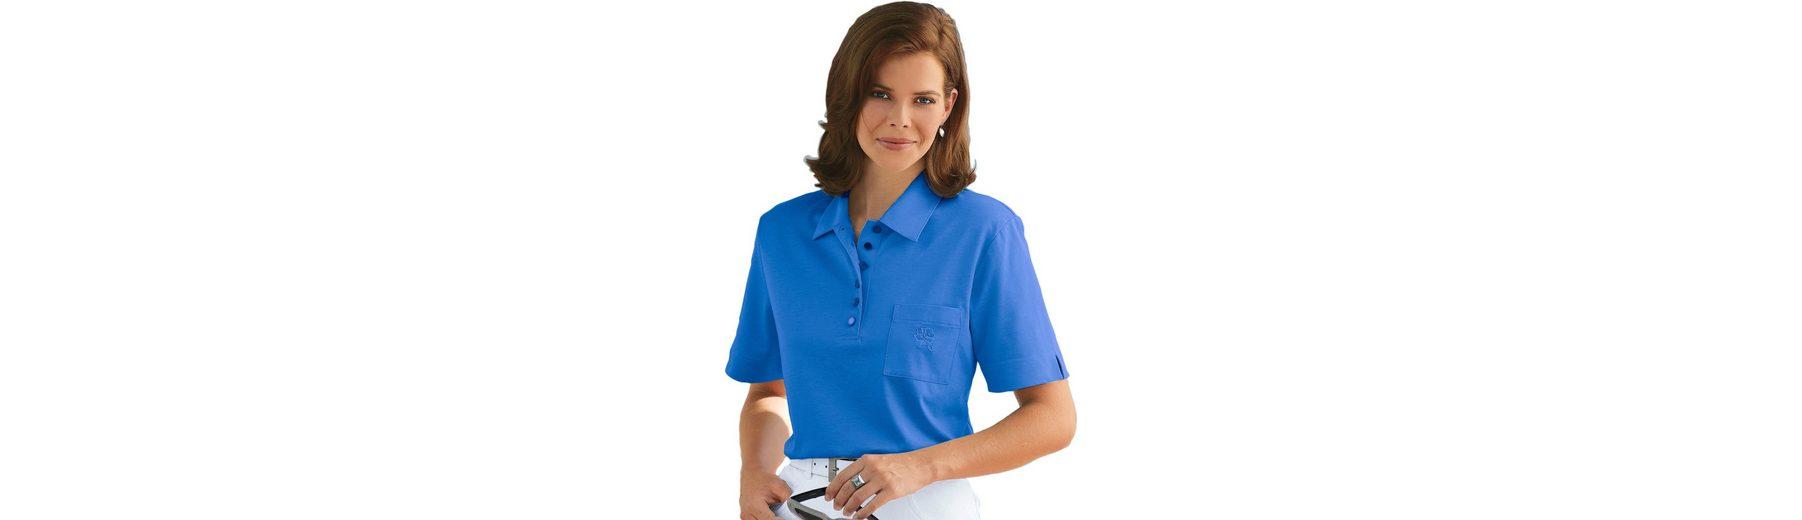 Billig Store Countdown-Paket Poloshirt mit Antipilling-Ausrüstung 8gcg7rmc8q